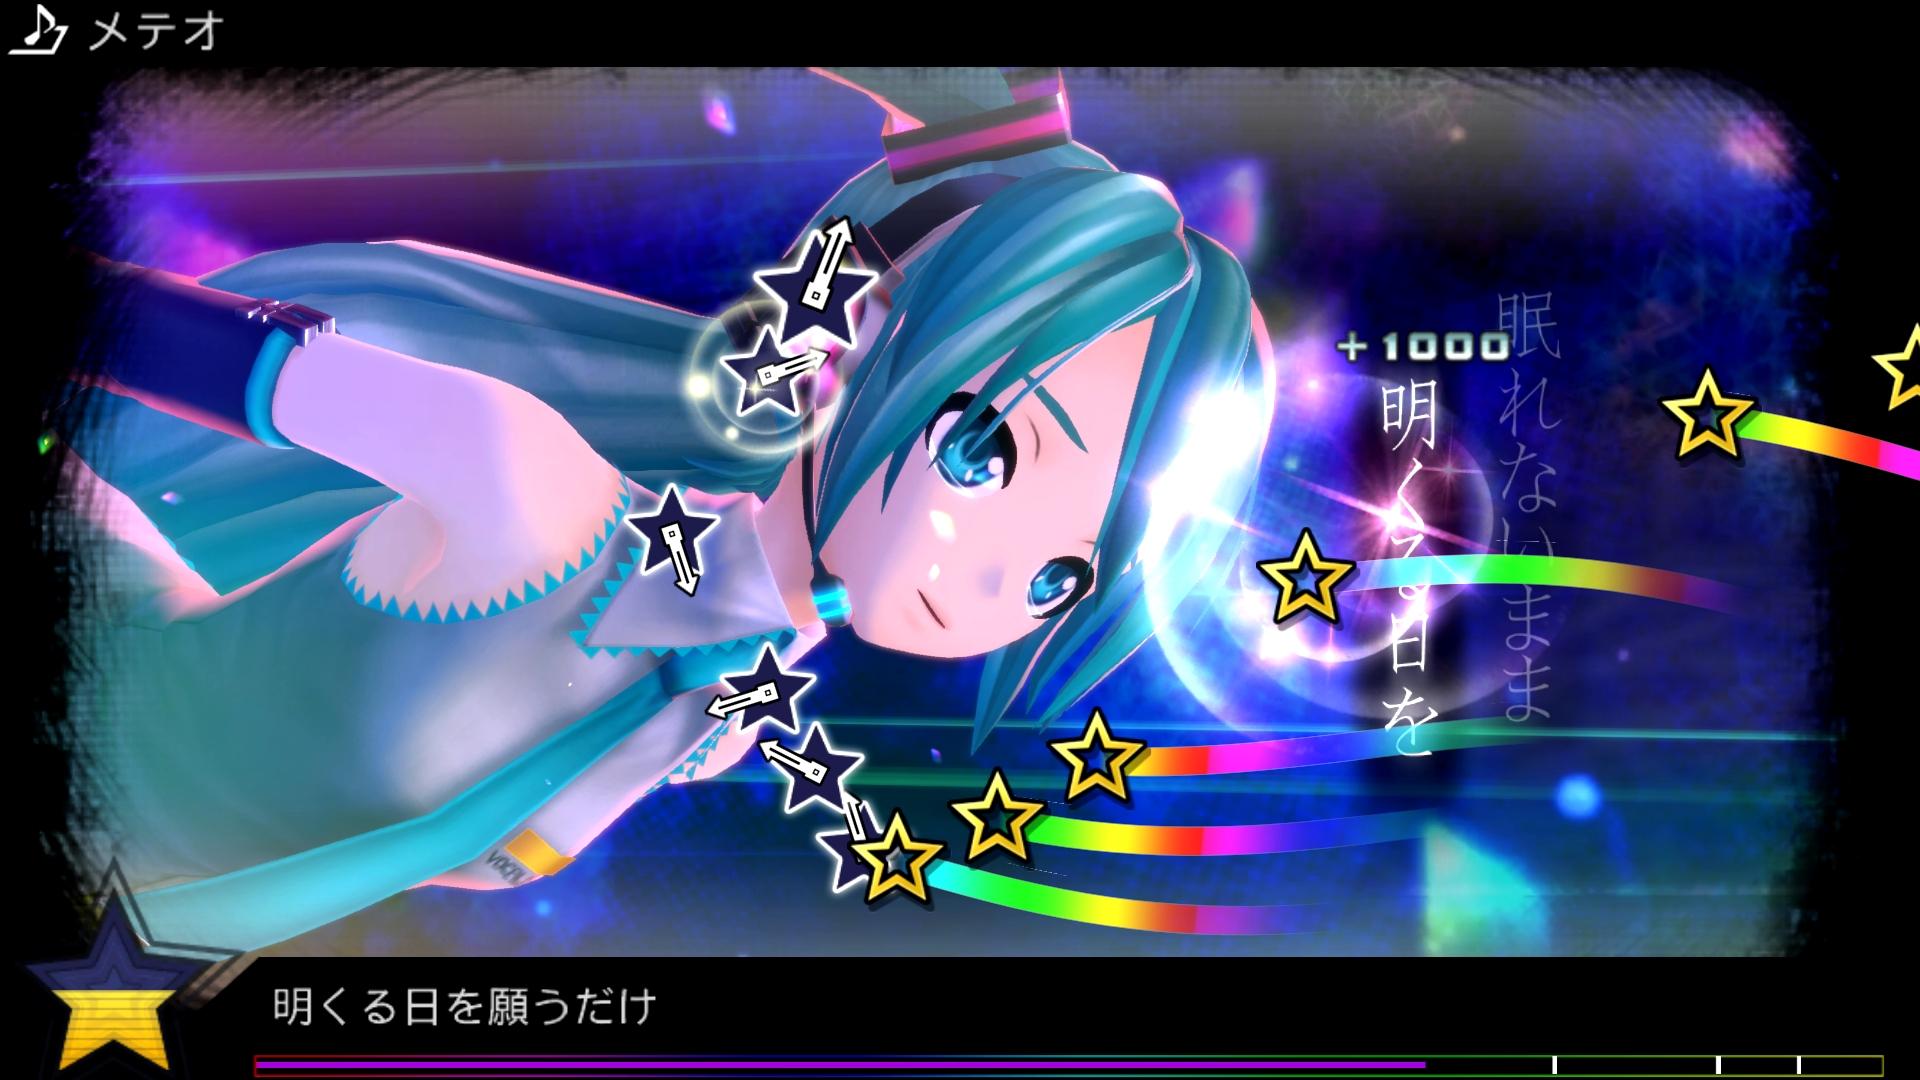 HatsuneMiku-ProjectDivaF2nd Multi Editeur 001